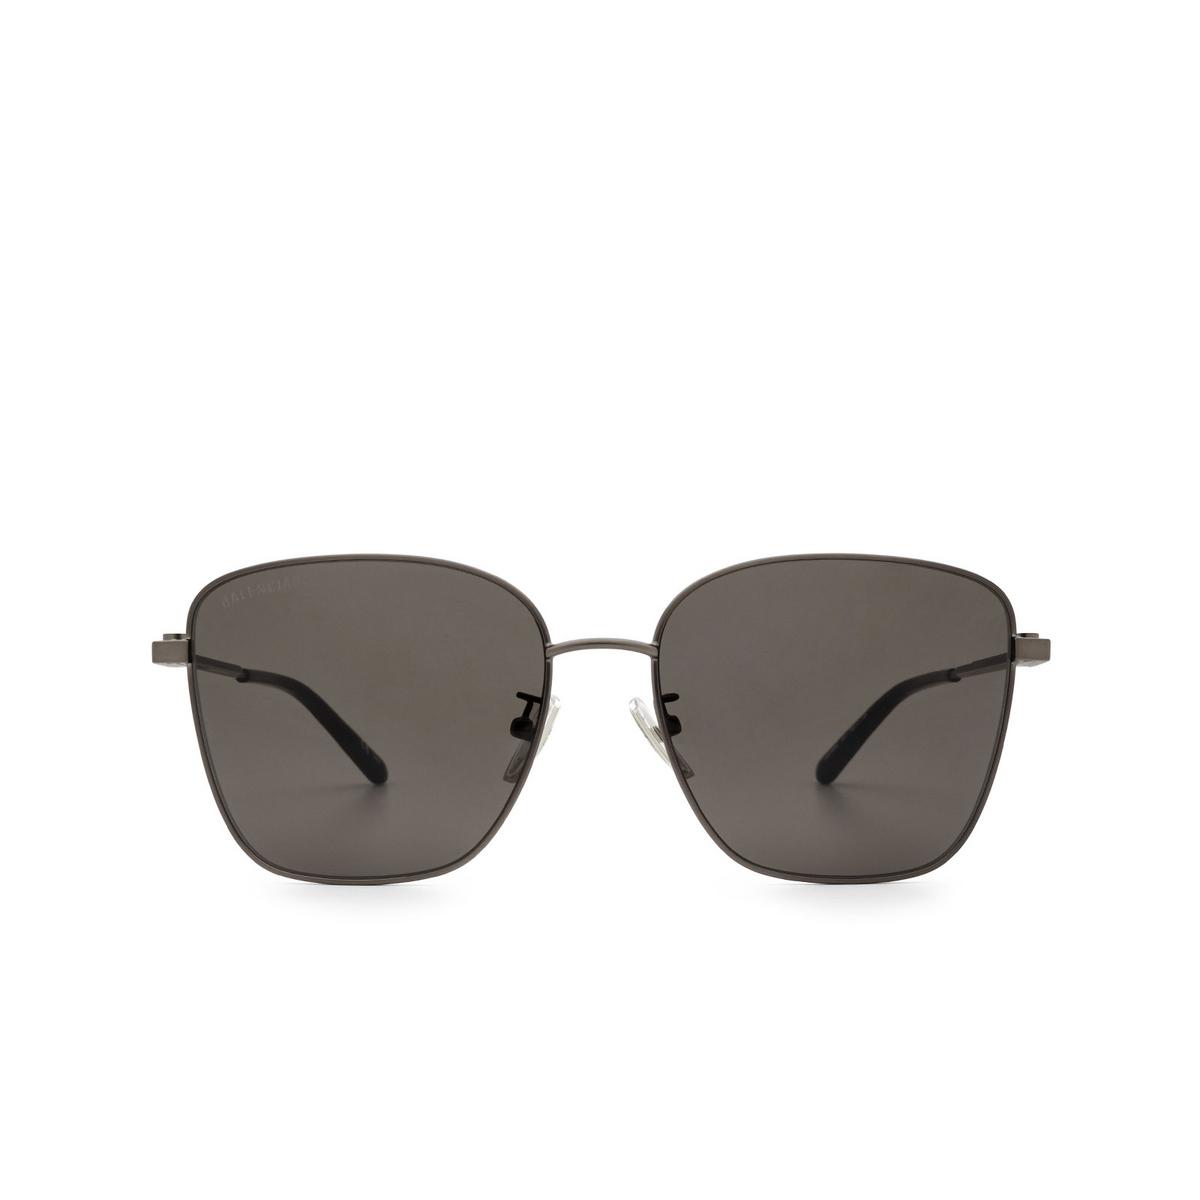 Balenciaga® Square Sunglasses: BB0165SA color Grey 001 - 1/3.